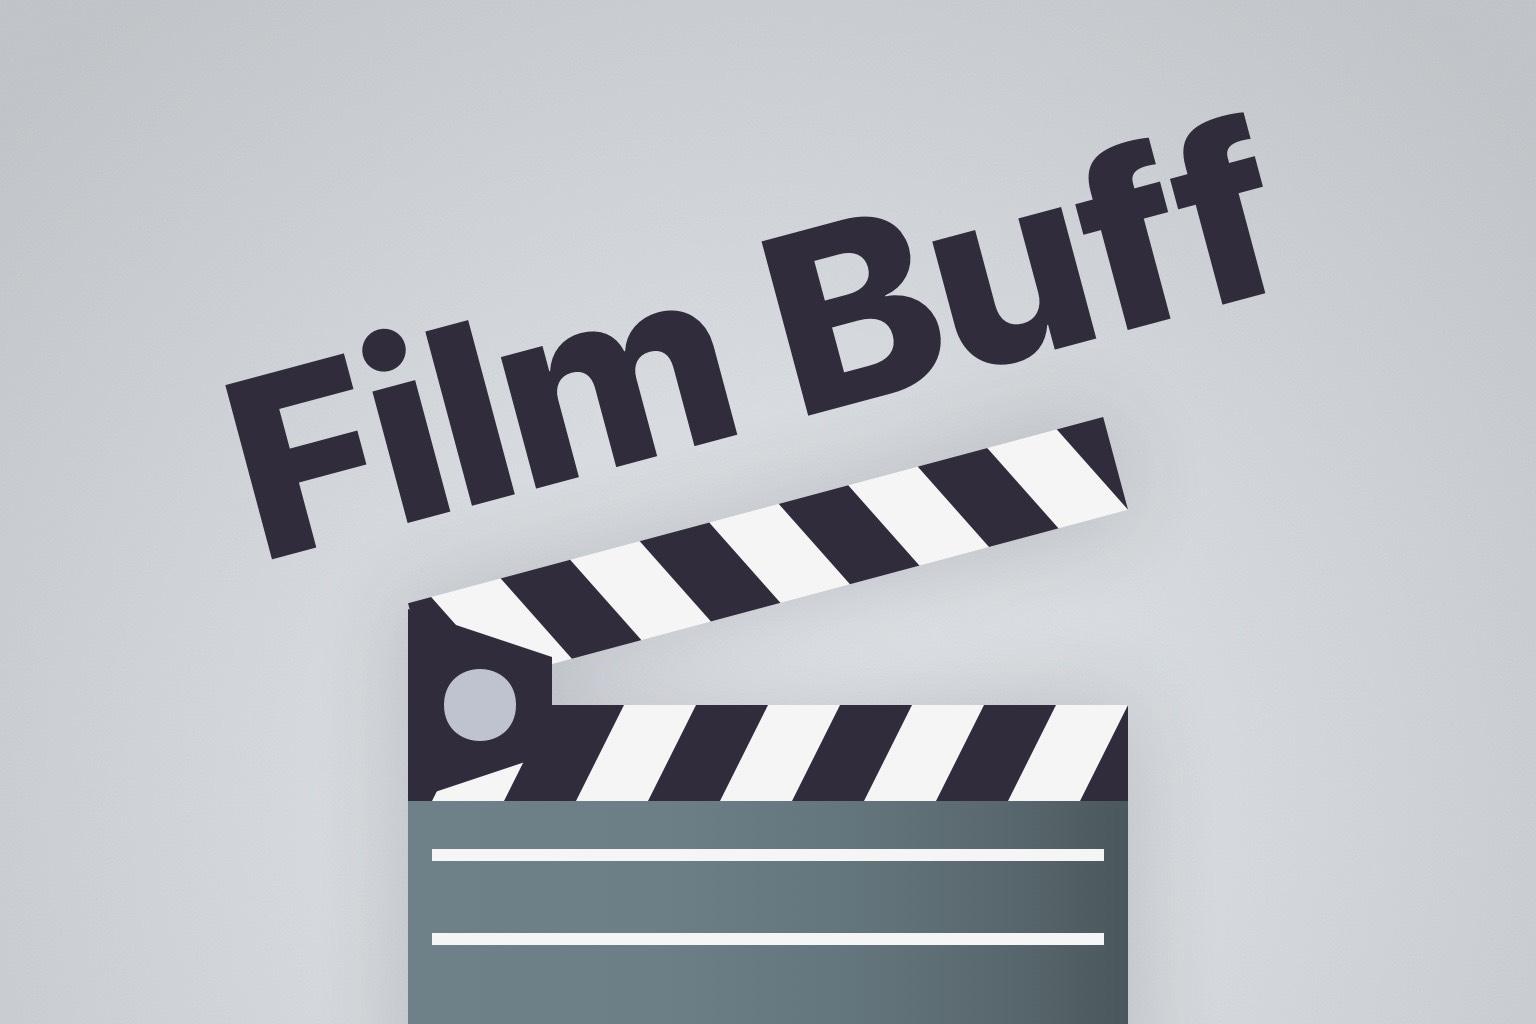 New channel: Film Buff